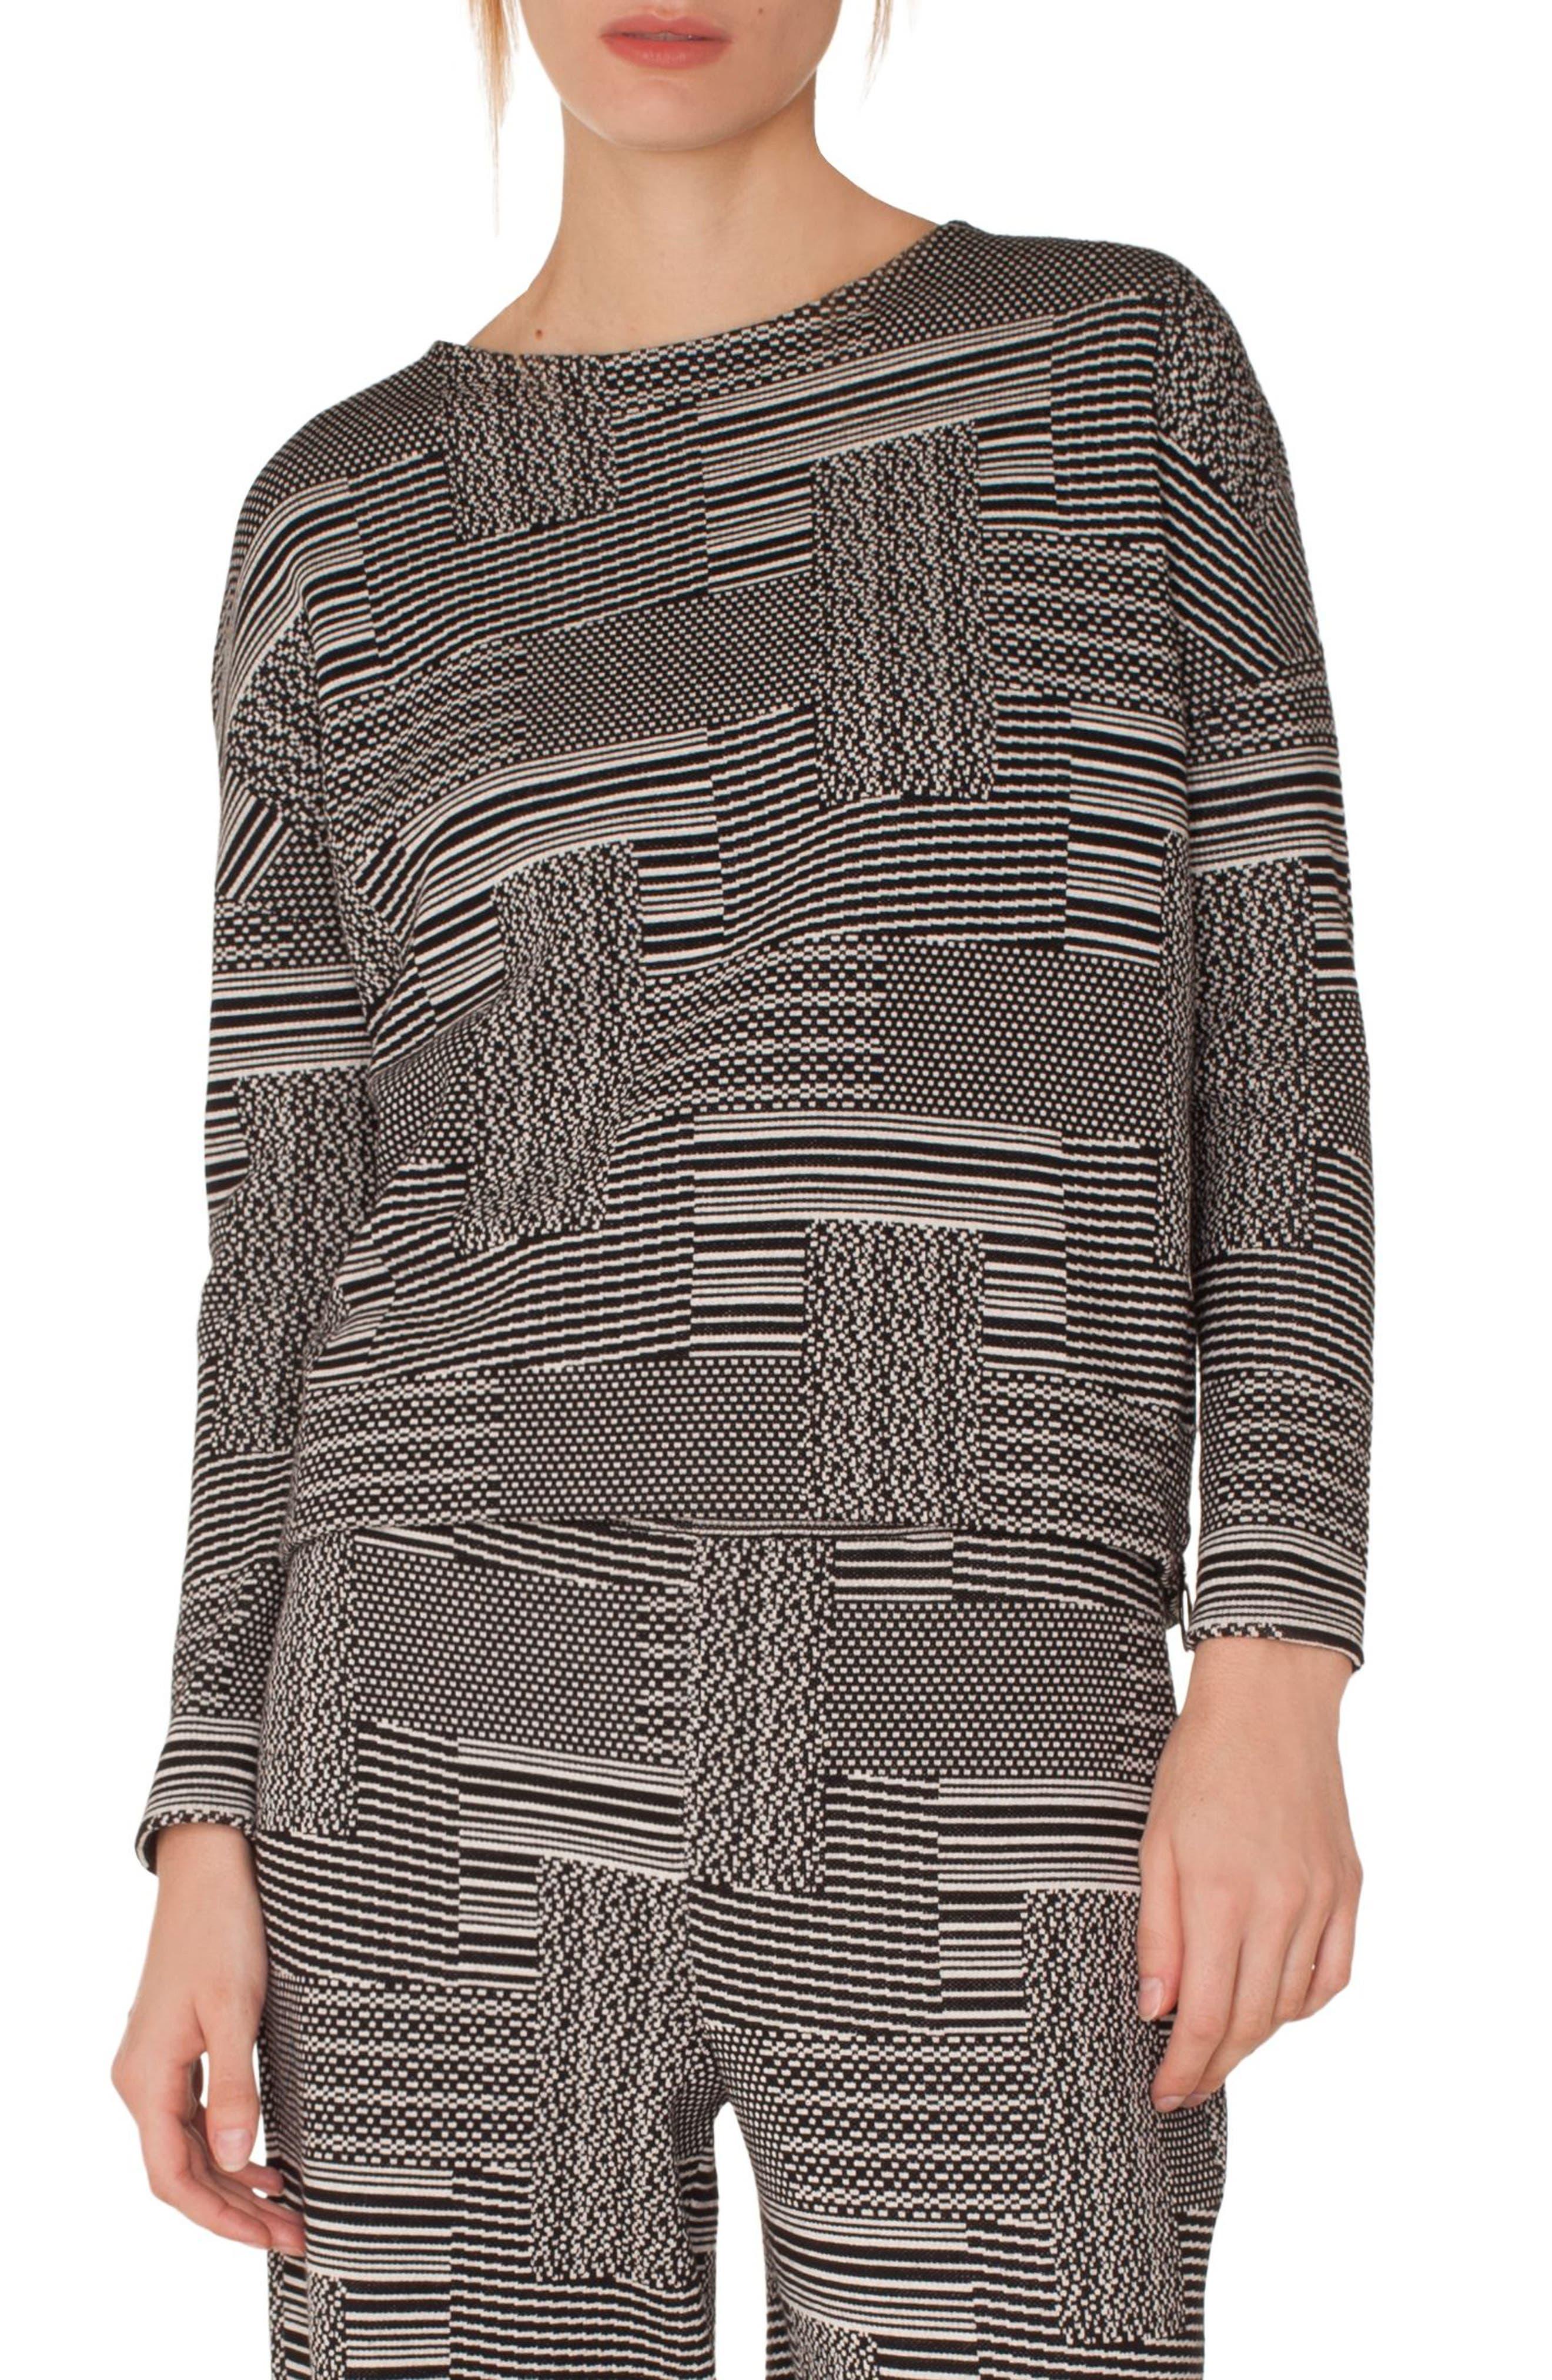 Wool & Cotton Patchwork Jacquard Top,                         Main,                         color, BLACK-CREAM